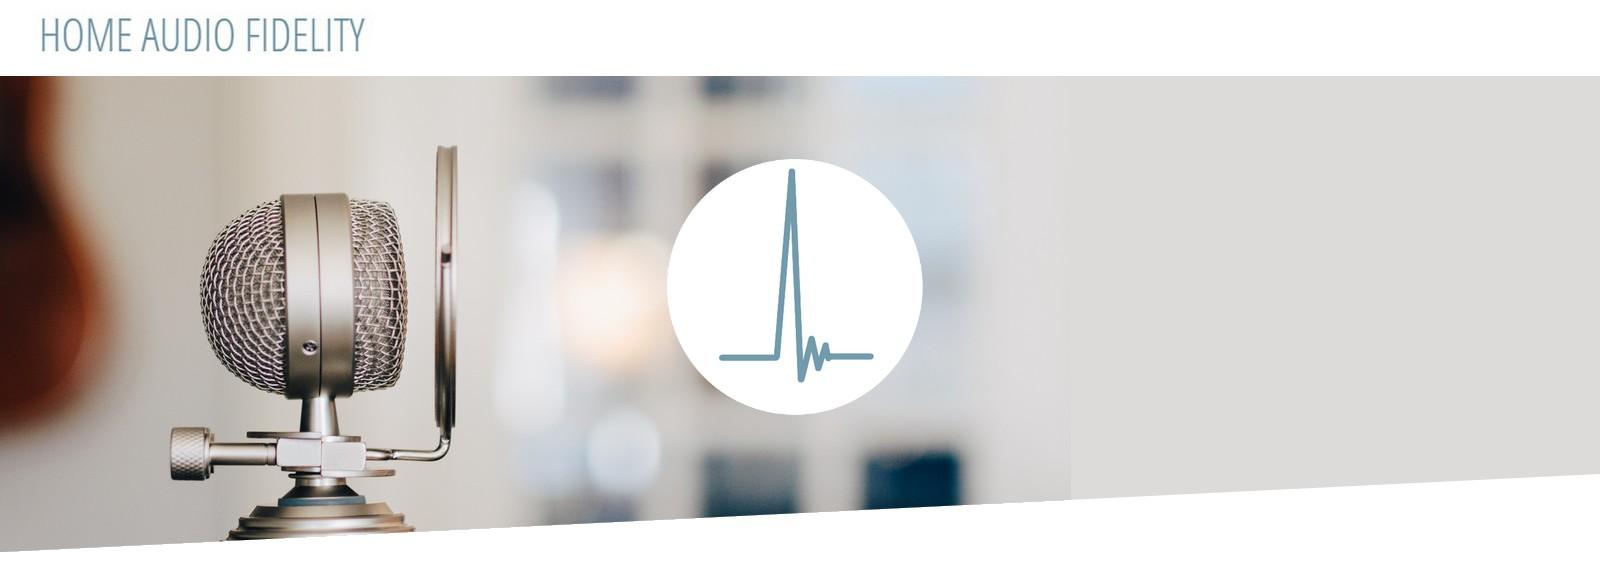 Pricing info - Home Audio Fidelity